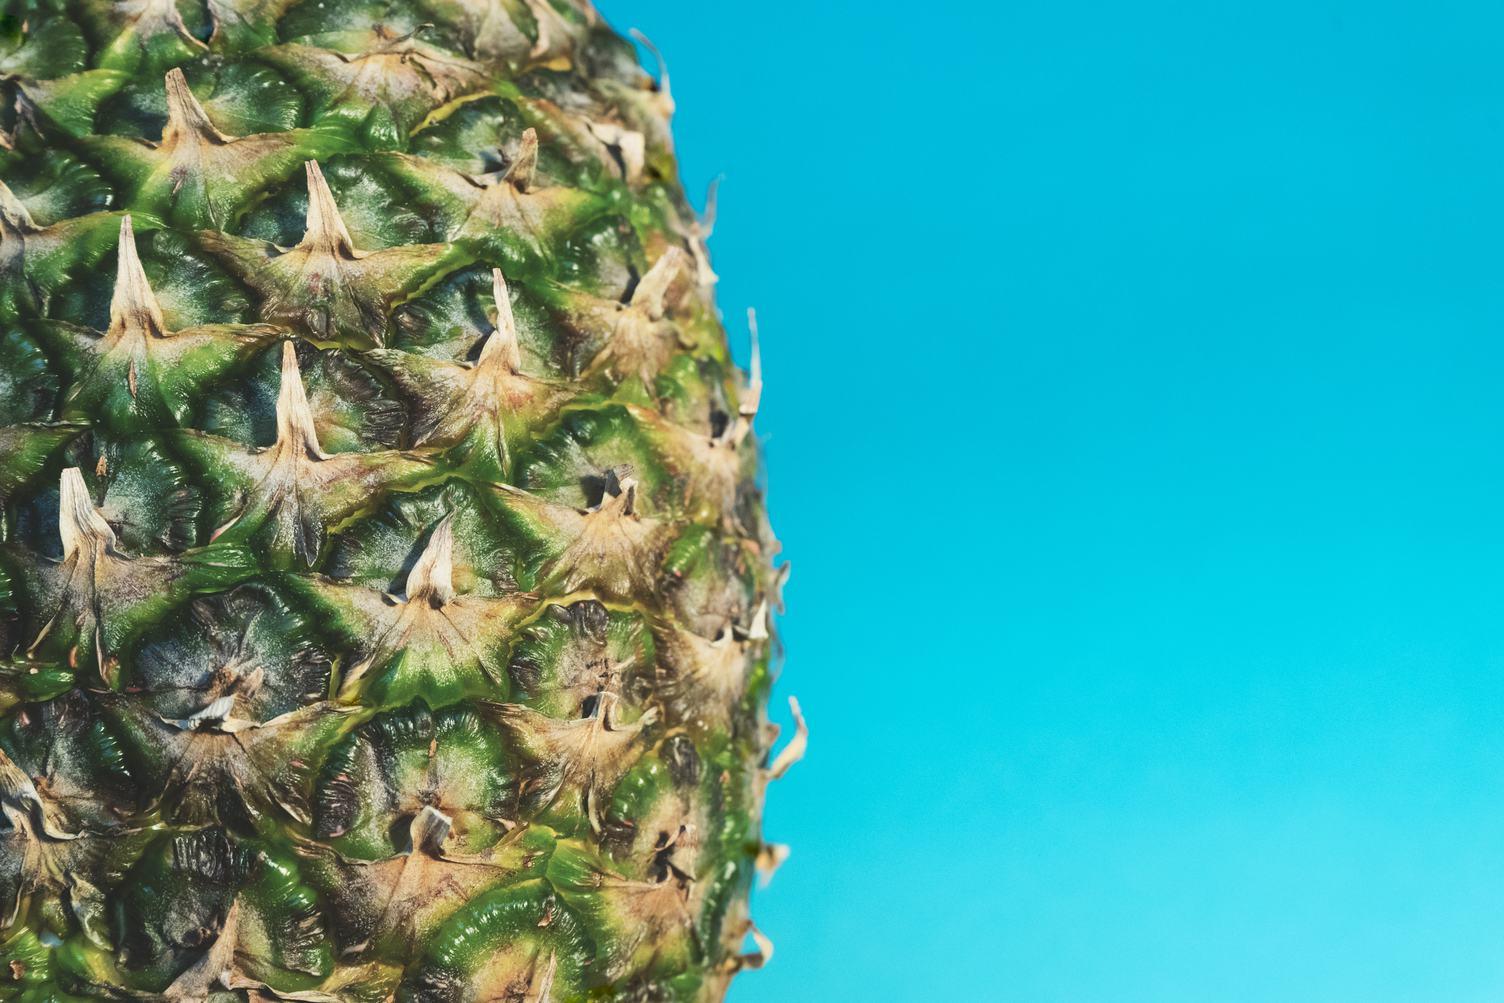 Pineapple Skin Closeup against Blue Wall